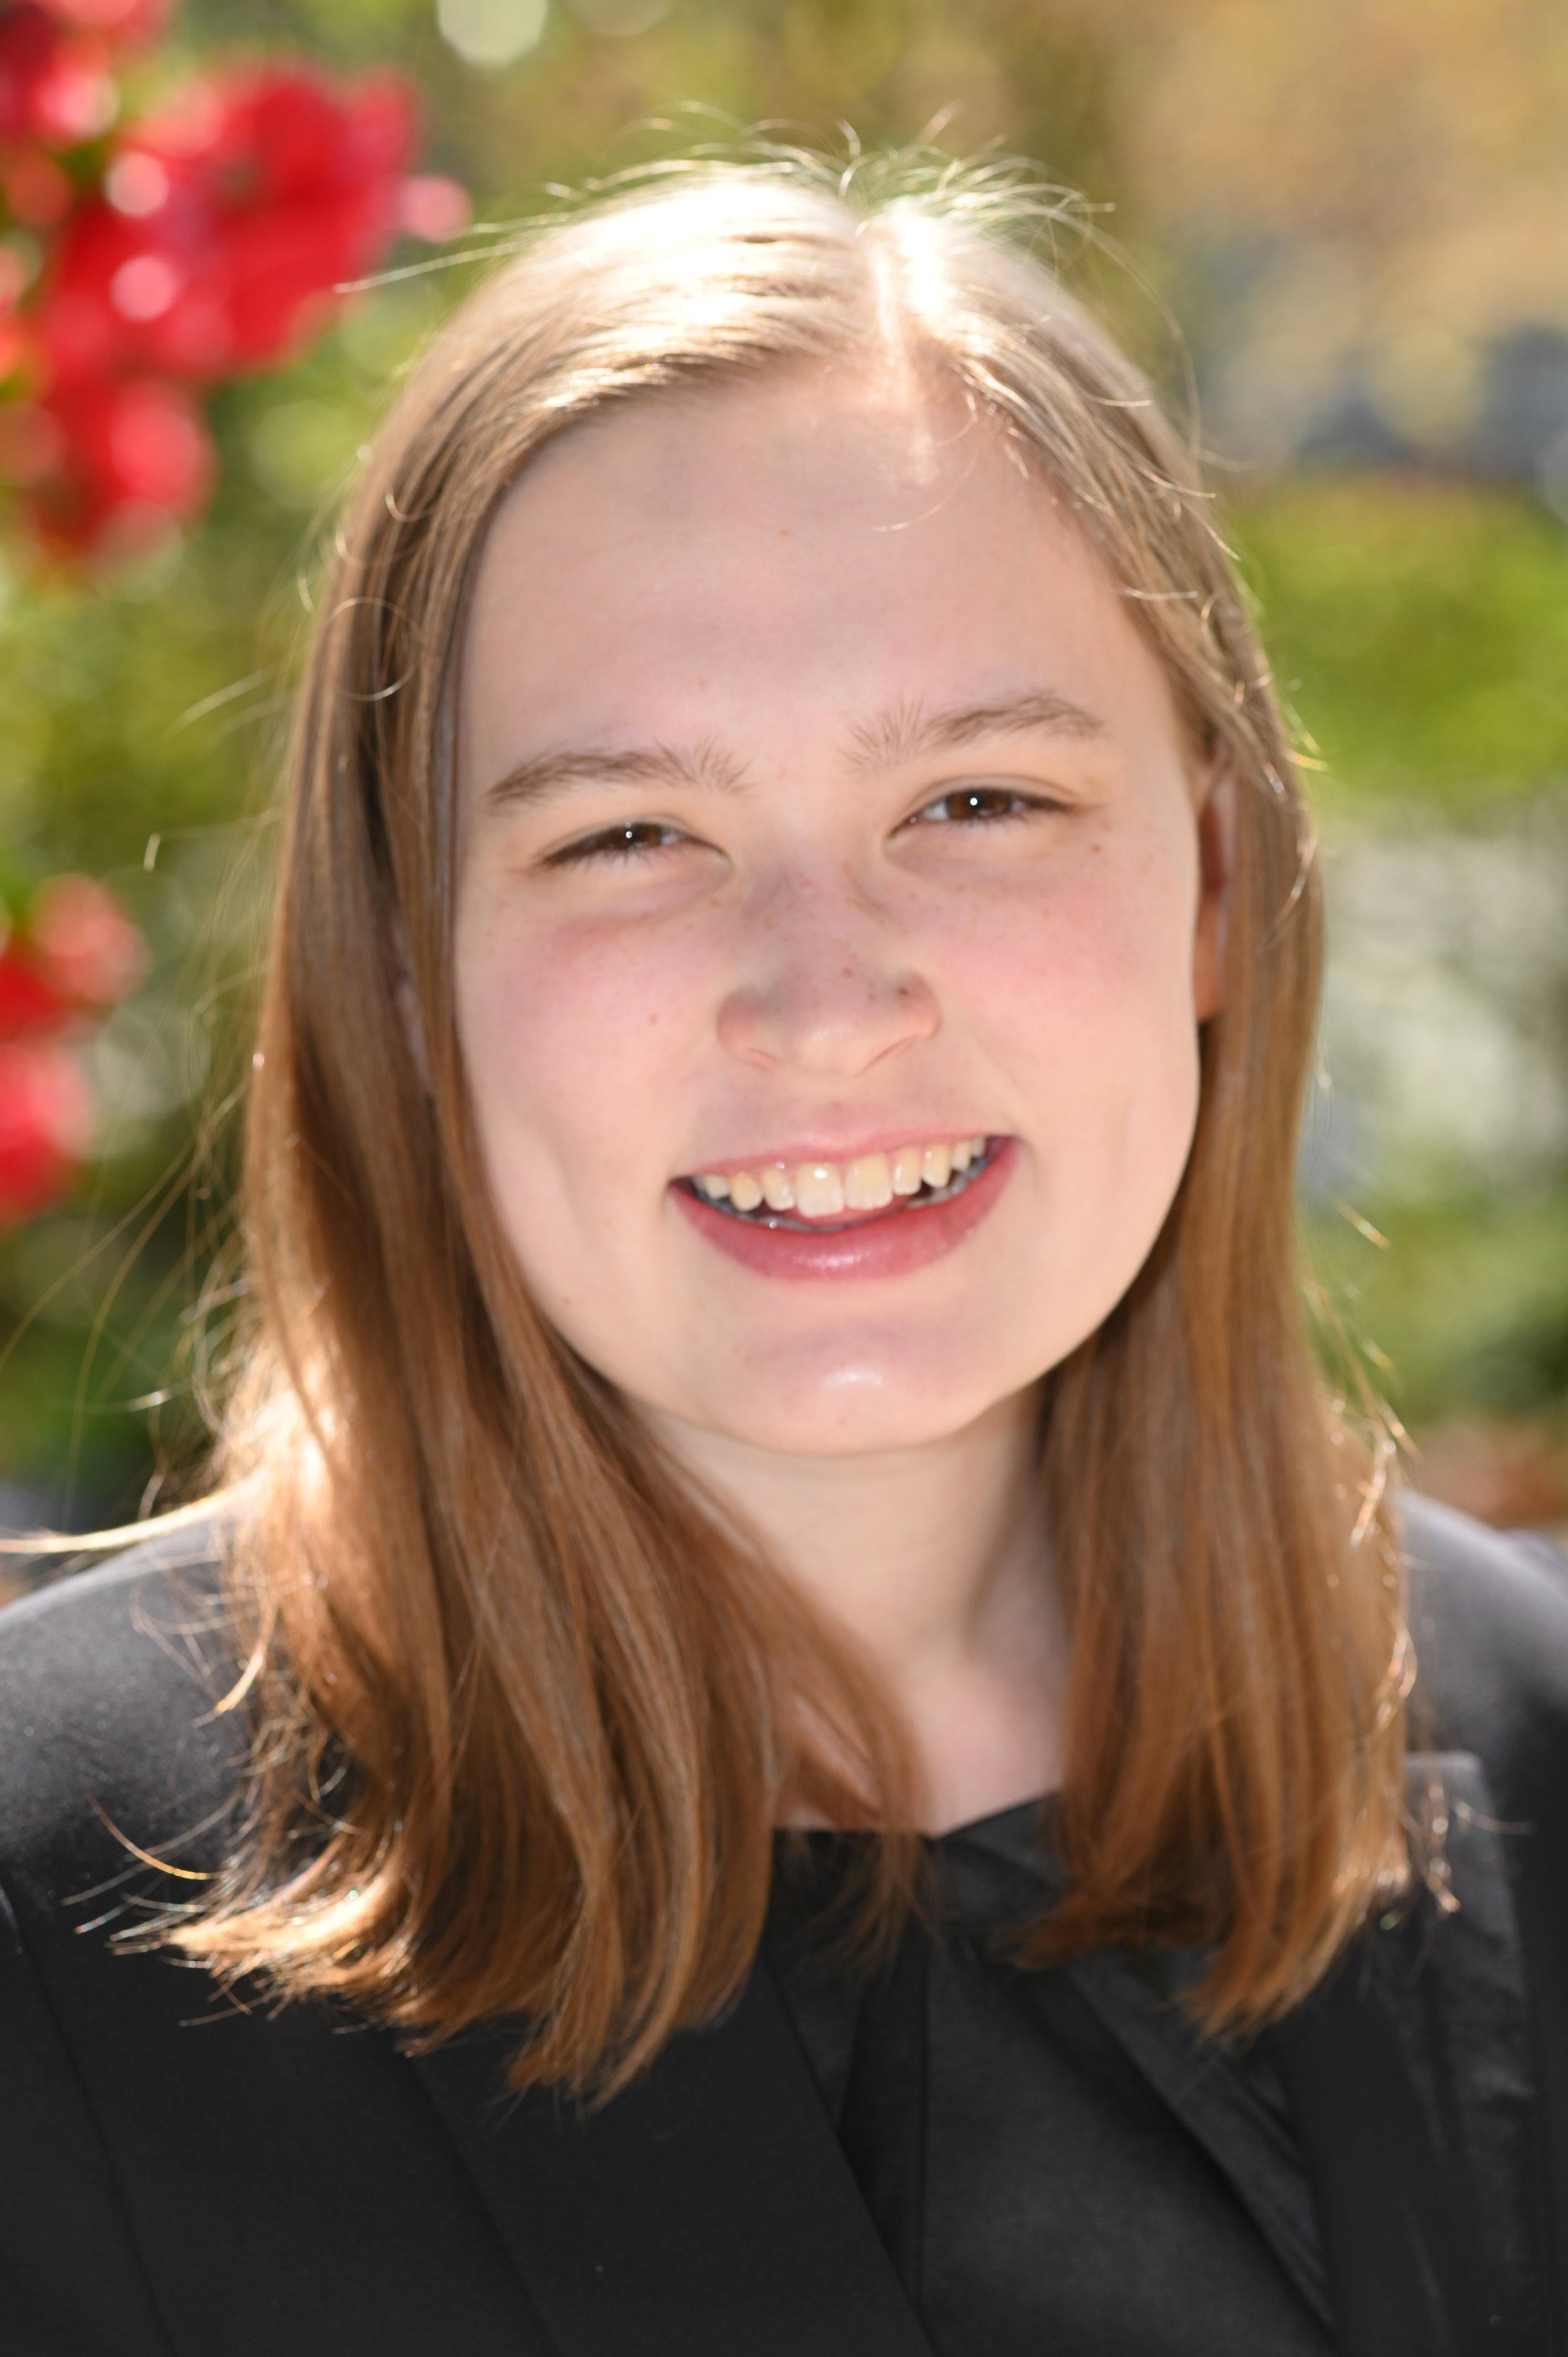 Rachel Seever Headshot_(2019-04-06 12-24-54)_DSC_1316.JPG